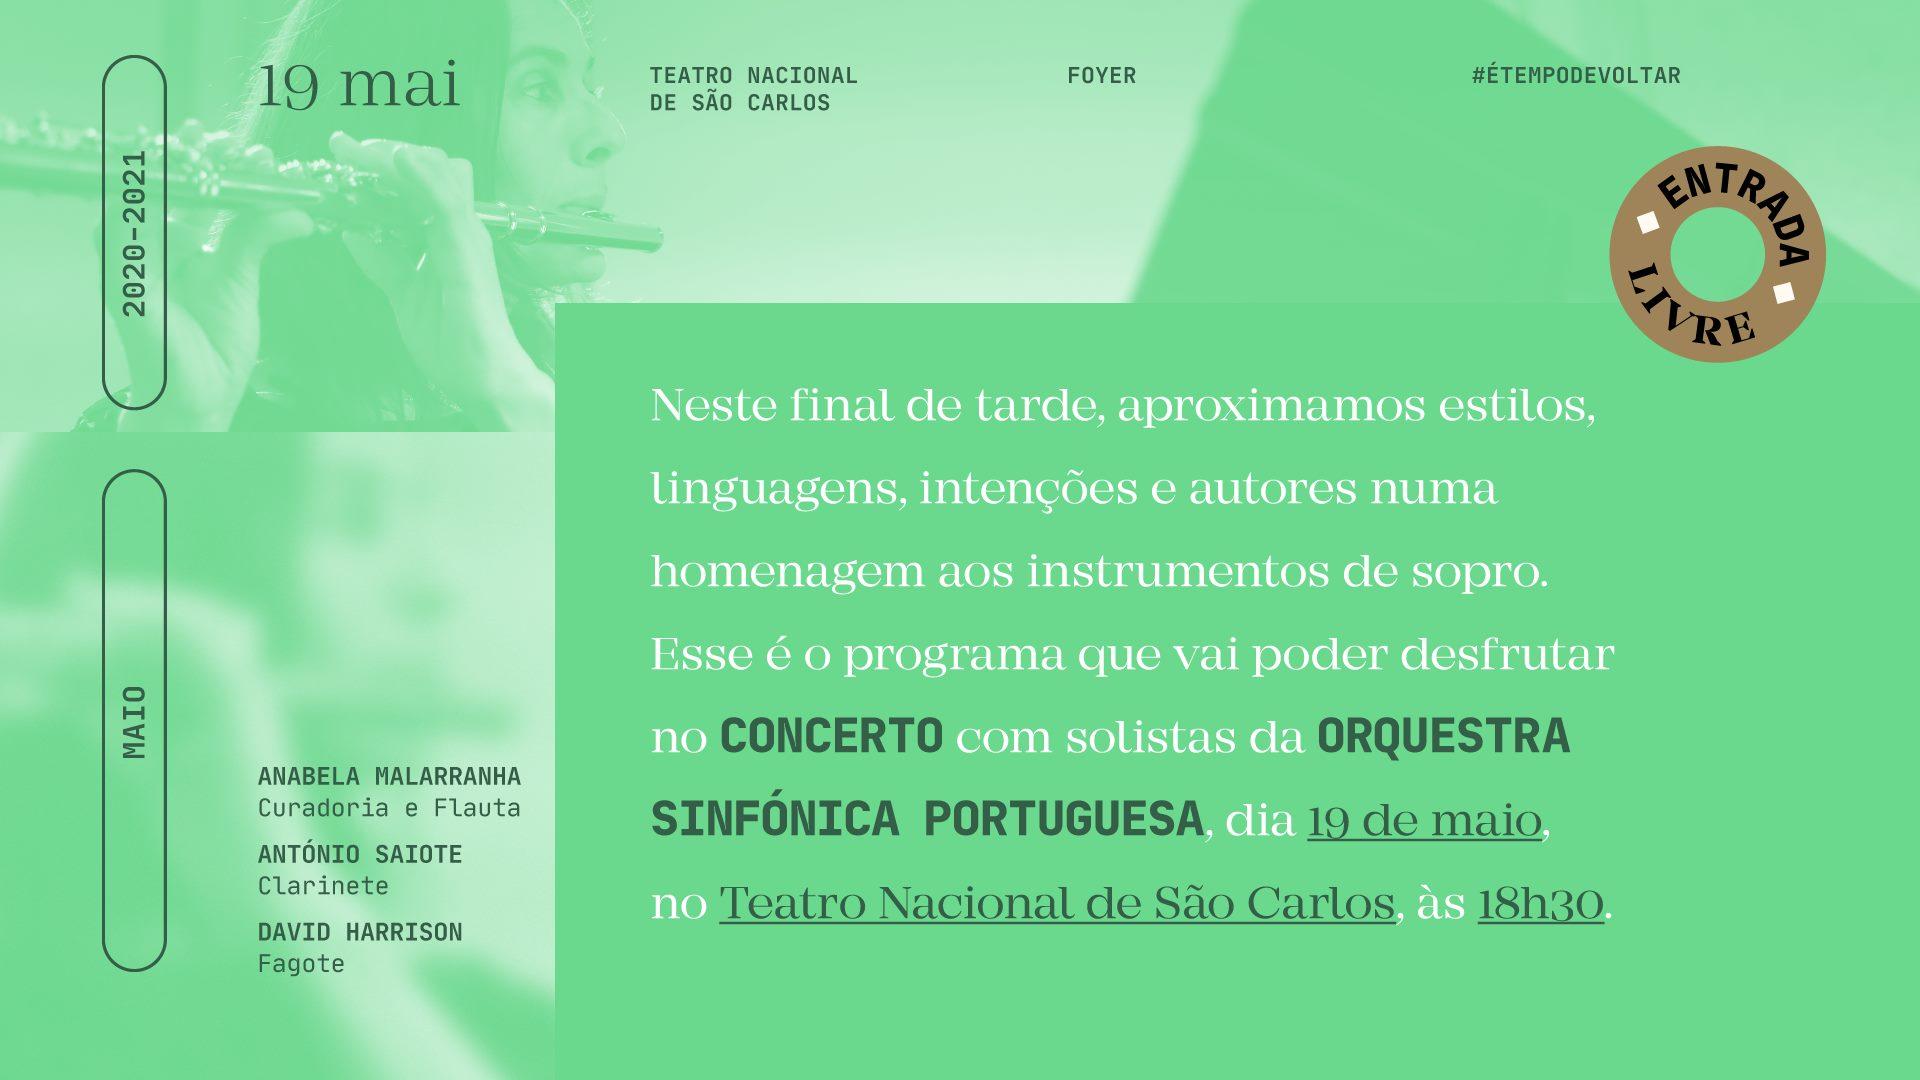 Concerto Solistas da Orquestra Sinfónica Portuguesa